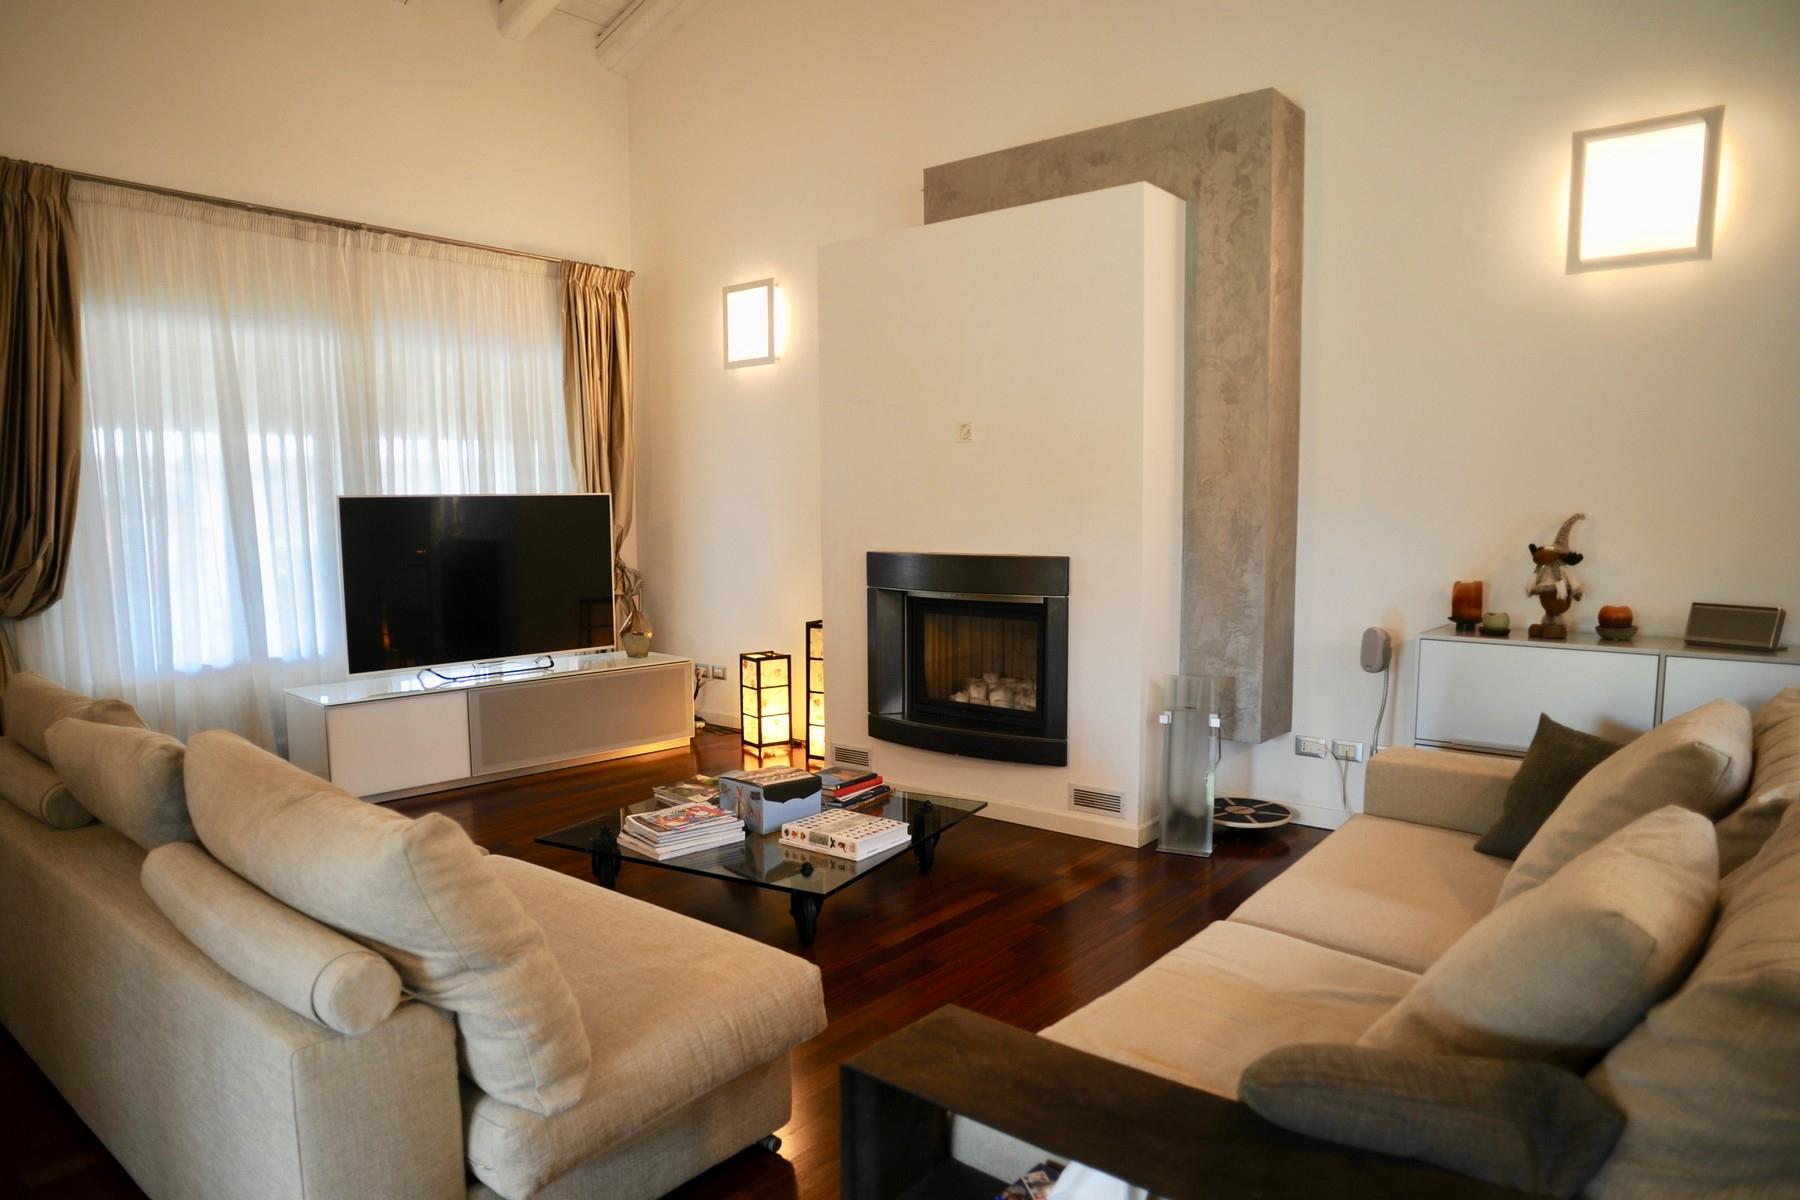 Casa indipendente in Vendita a Desenzano Del Garda via grezze